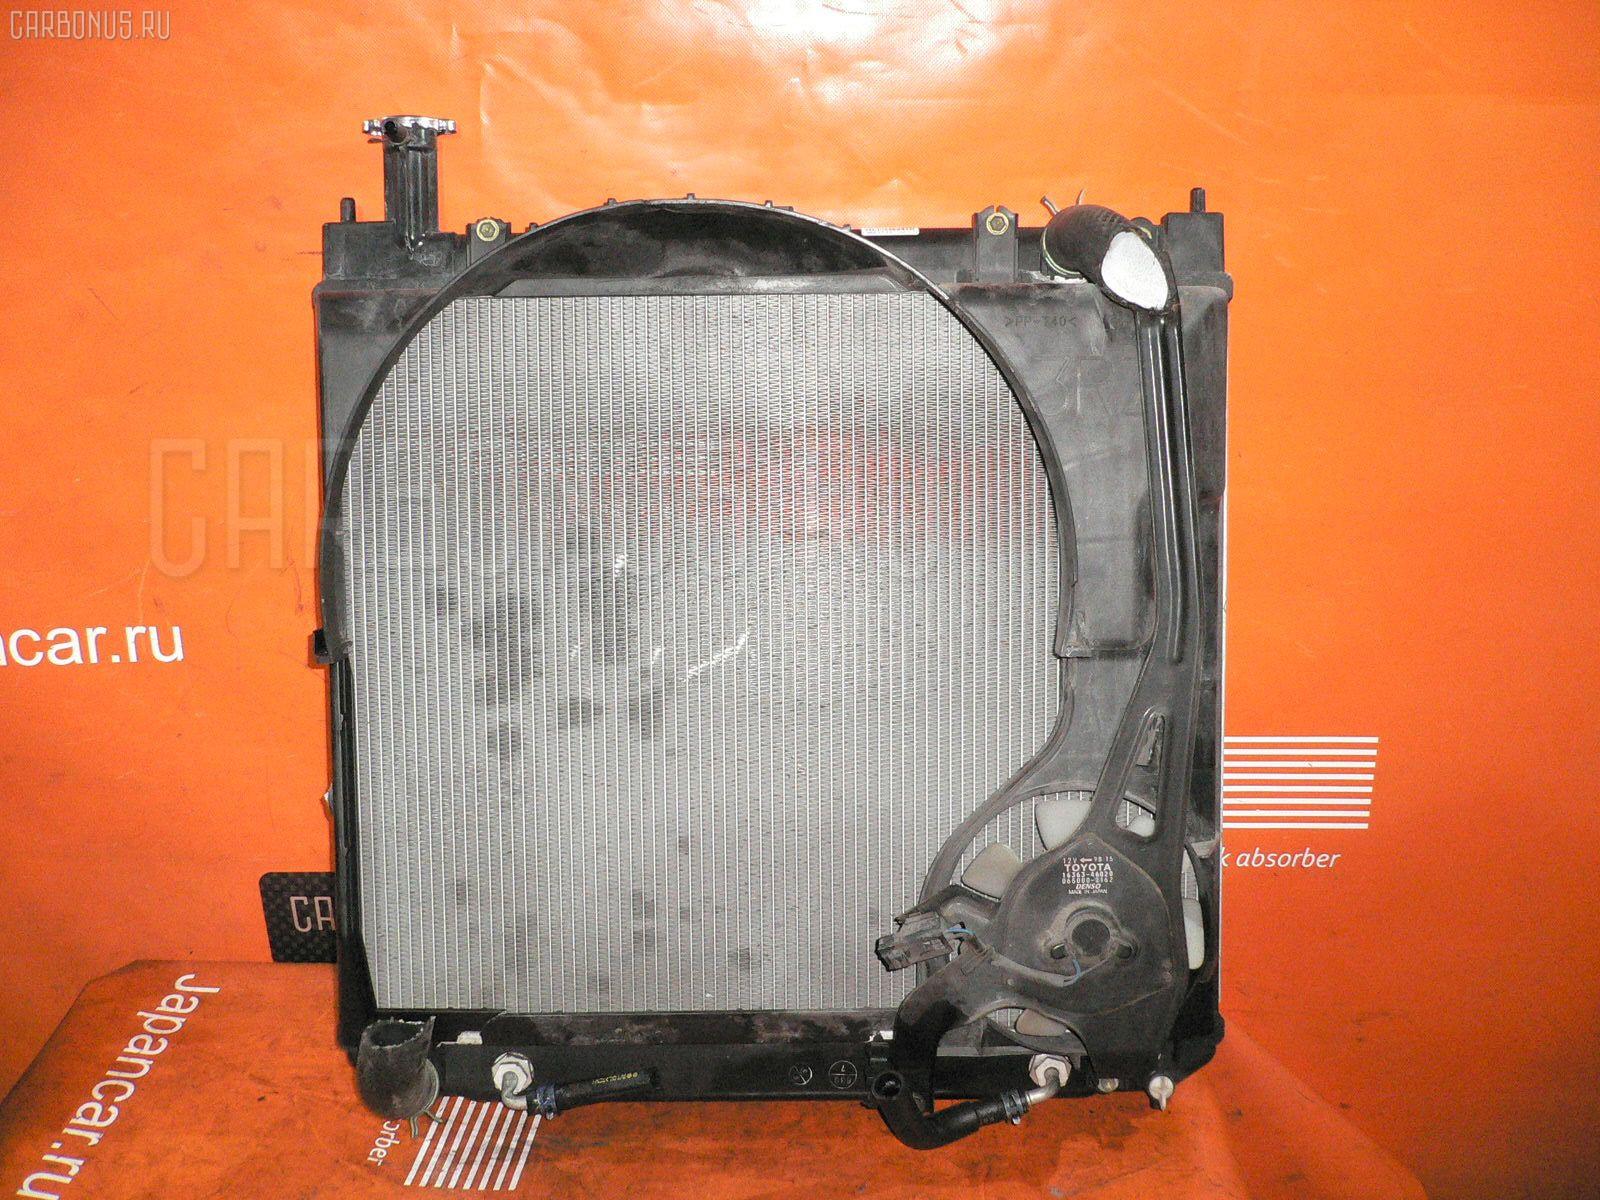 Радиатор ДВС TOYOTA HIACE REGIUS RCH41W 3RZ-FE. Фото 3